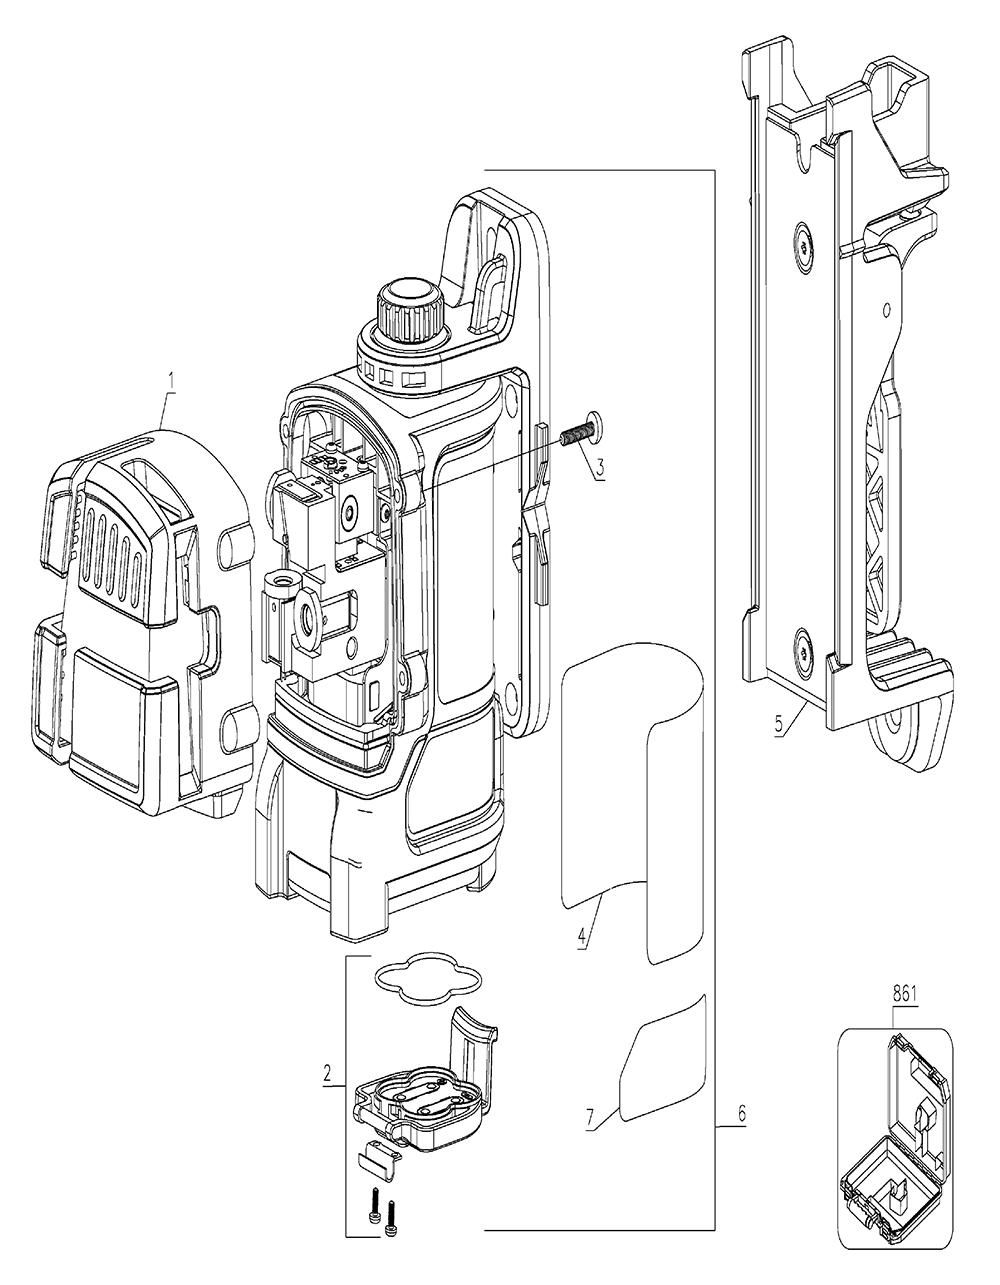 Buy Dewalt Dw089k Type 1 Self Leveling 3 Beam Line Laser Replacement Wilton D6 Parts List And Diagram Ereplacementpartscom Schematic